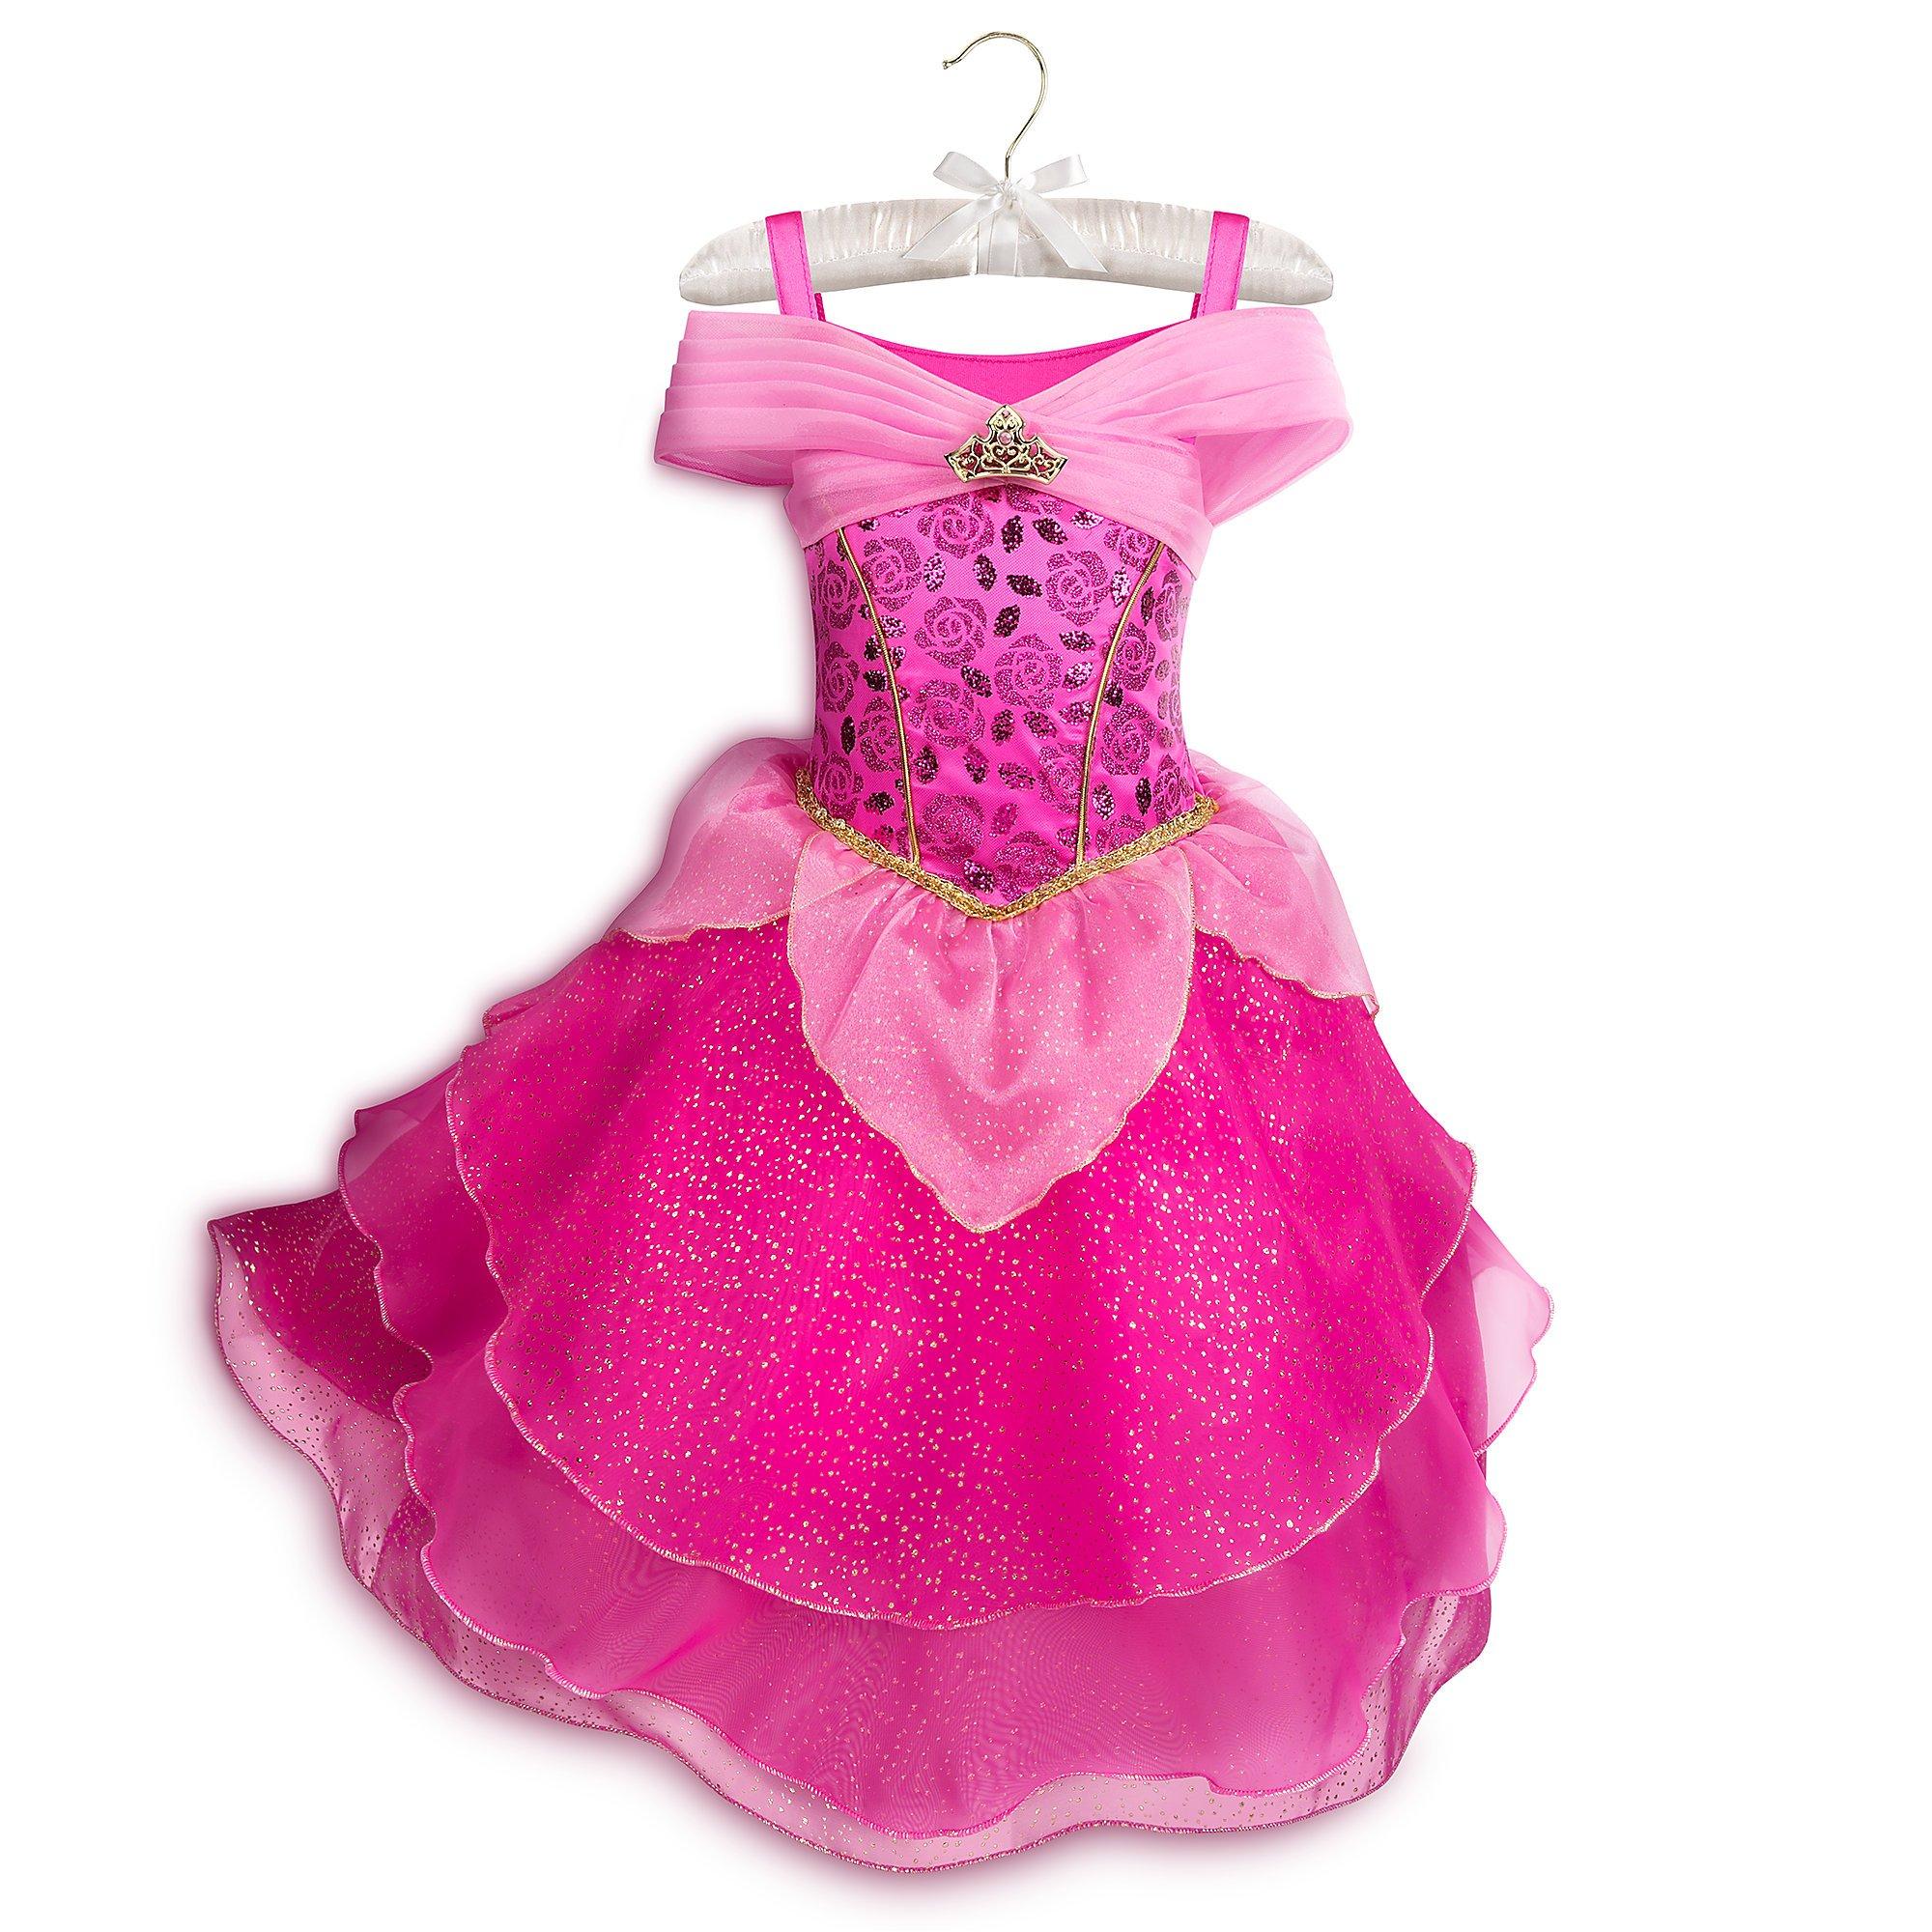 Disney Aurora Costume for Kids - Sleeping Beauty Size 5/6 Pink